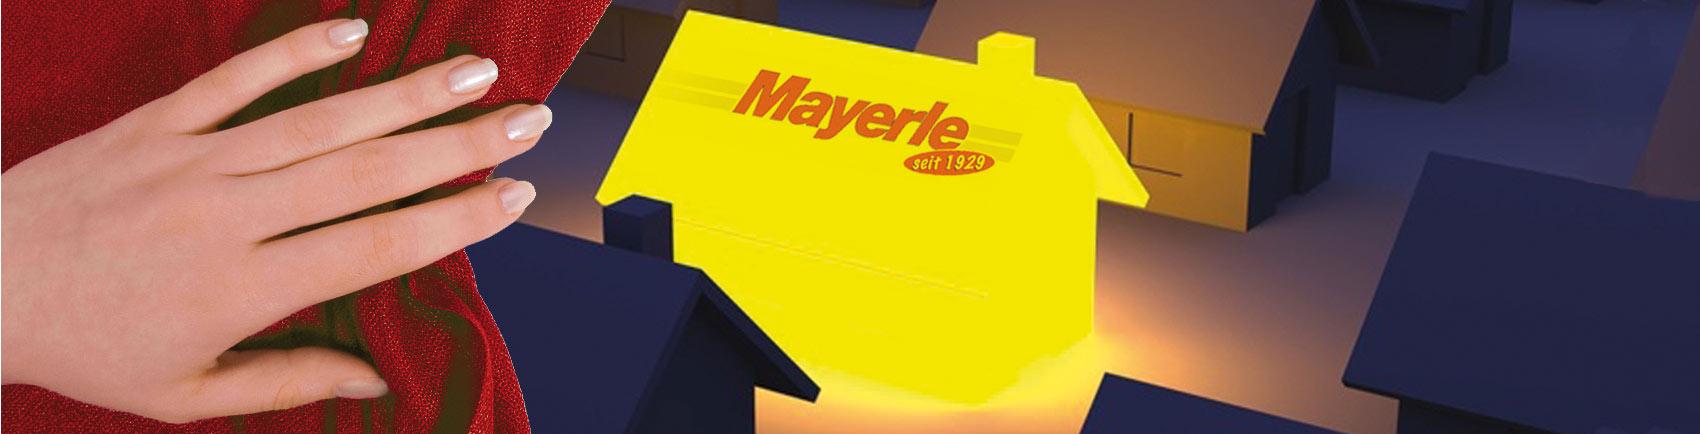 mayerle-bau-slider1